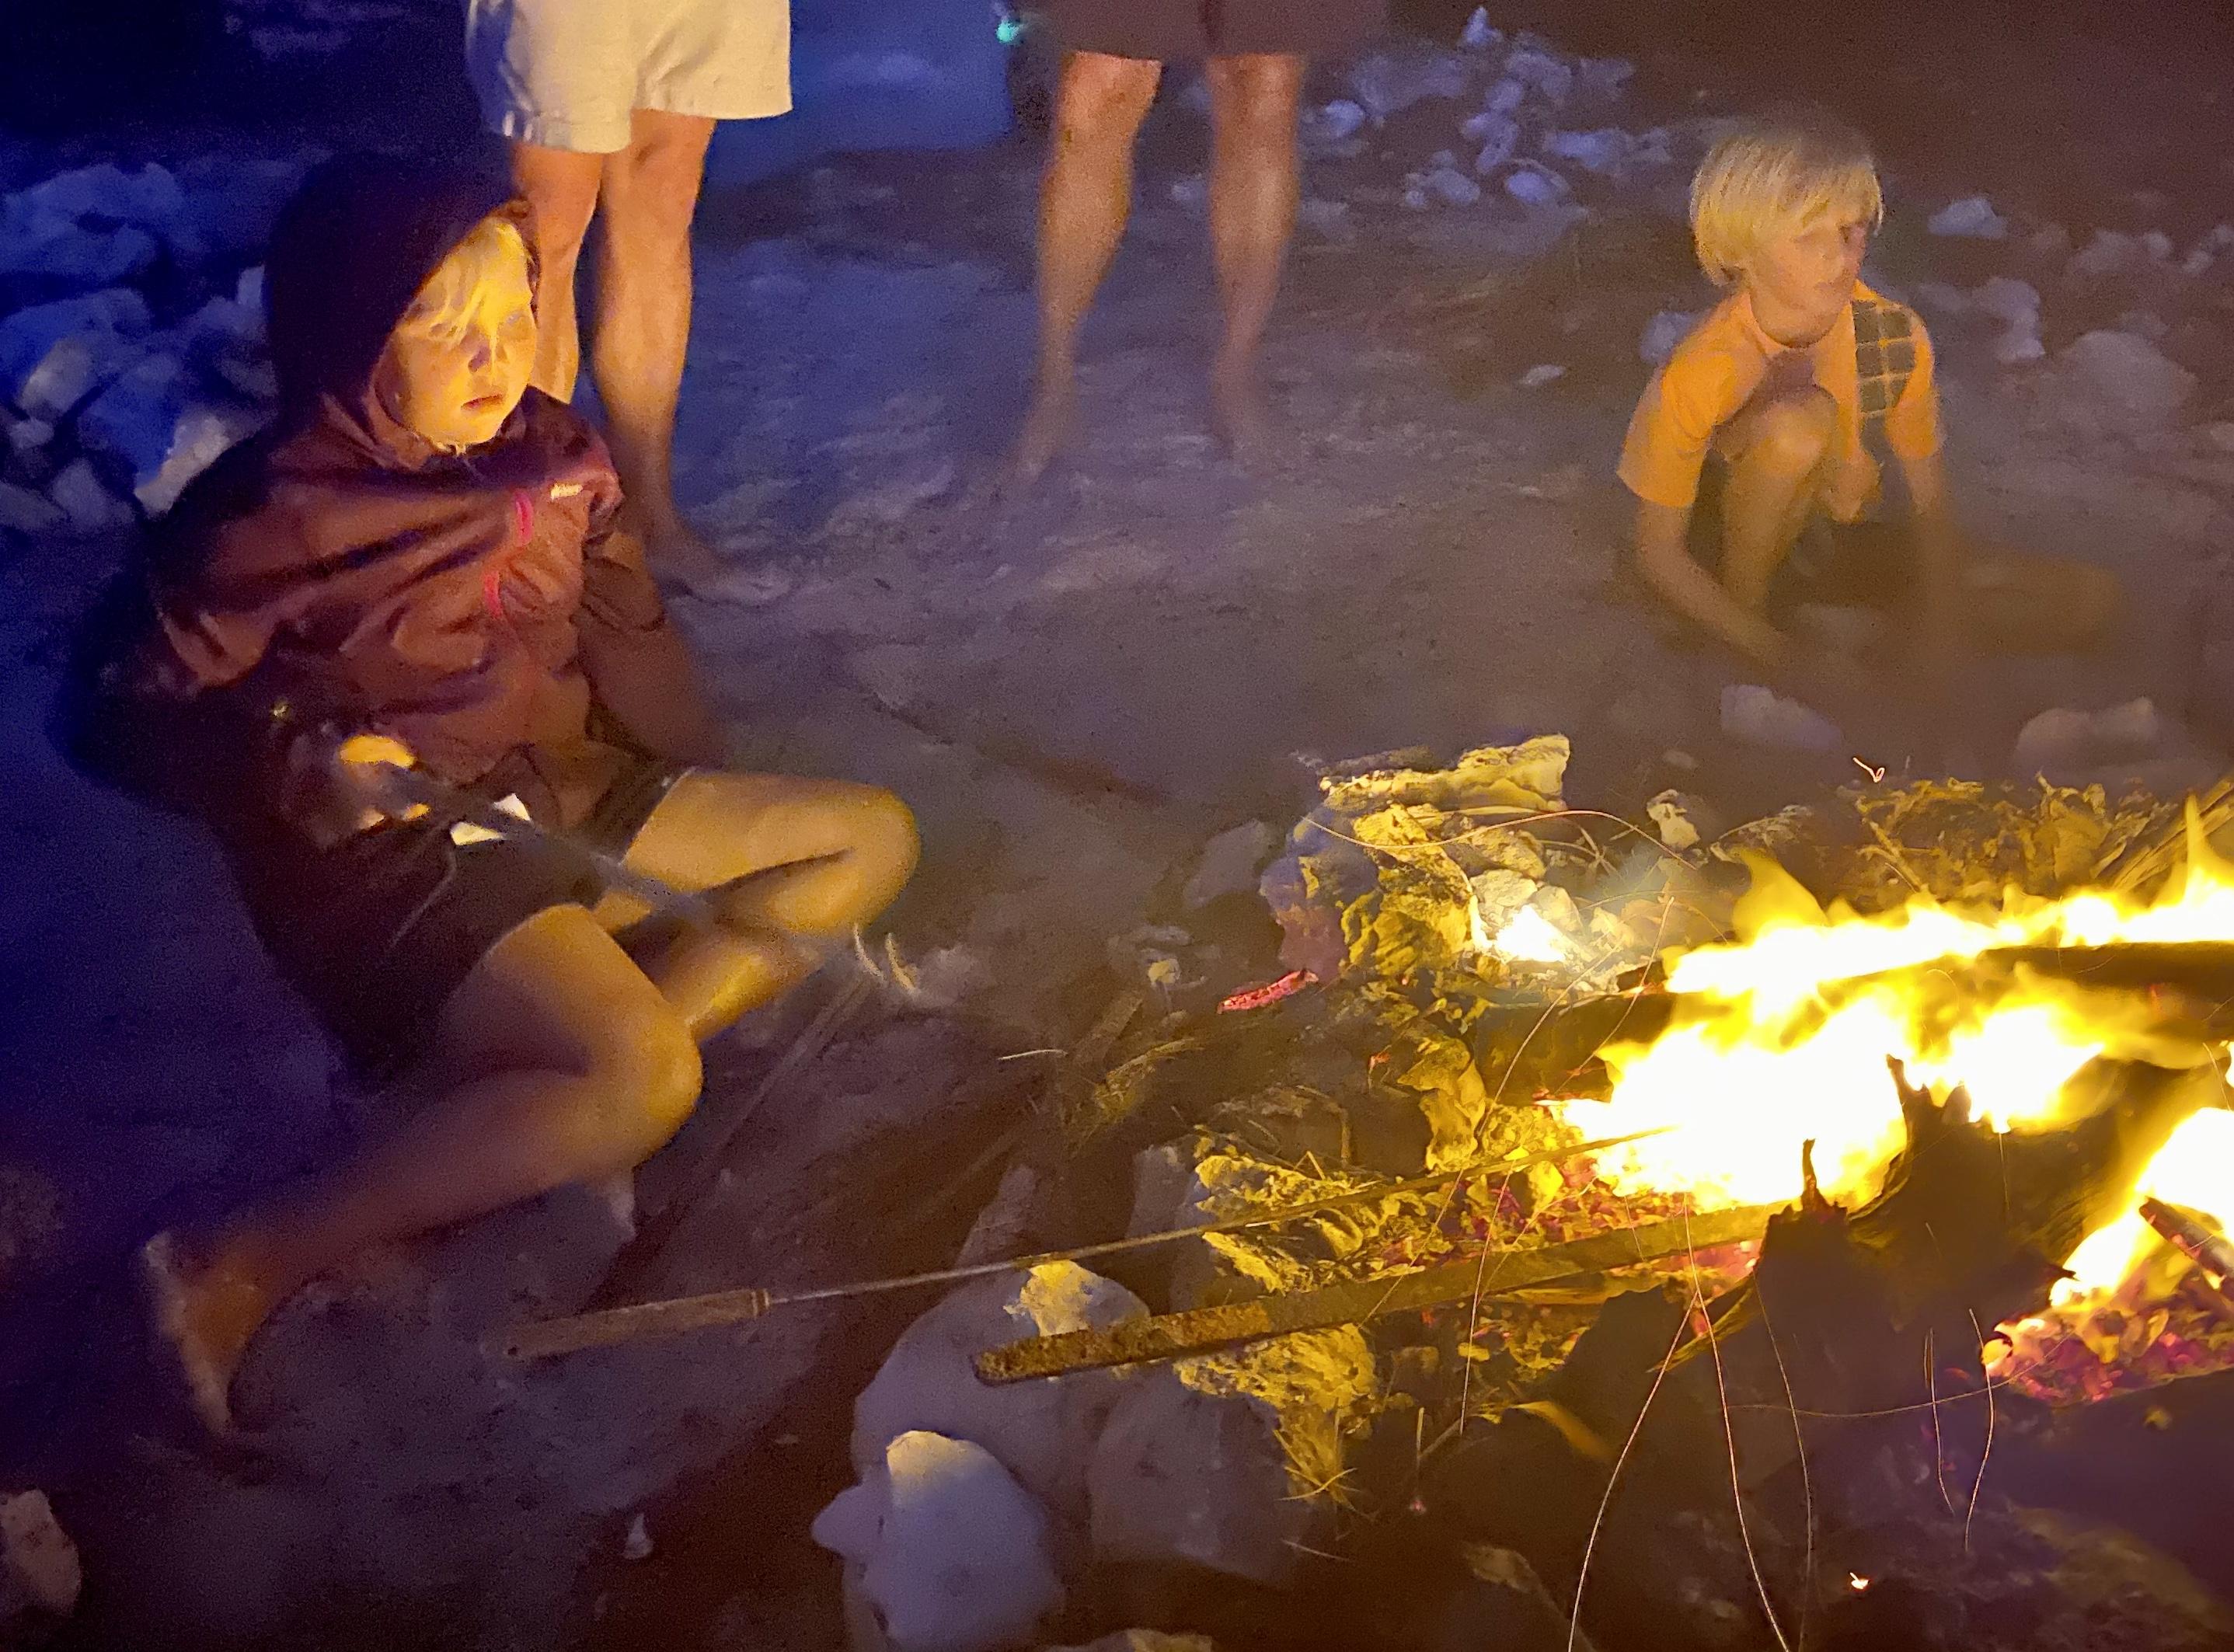 Lorelei roasting smores